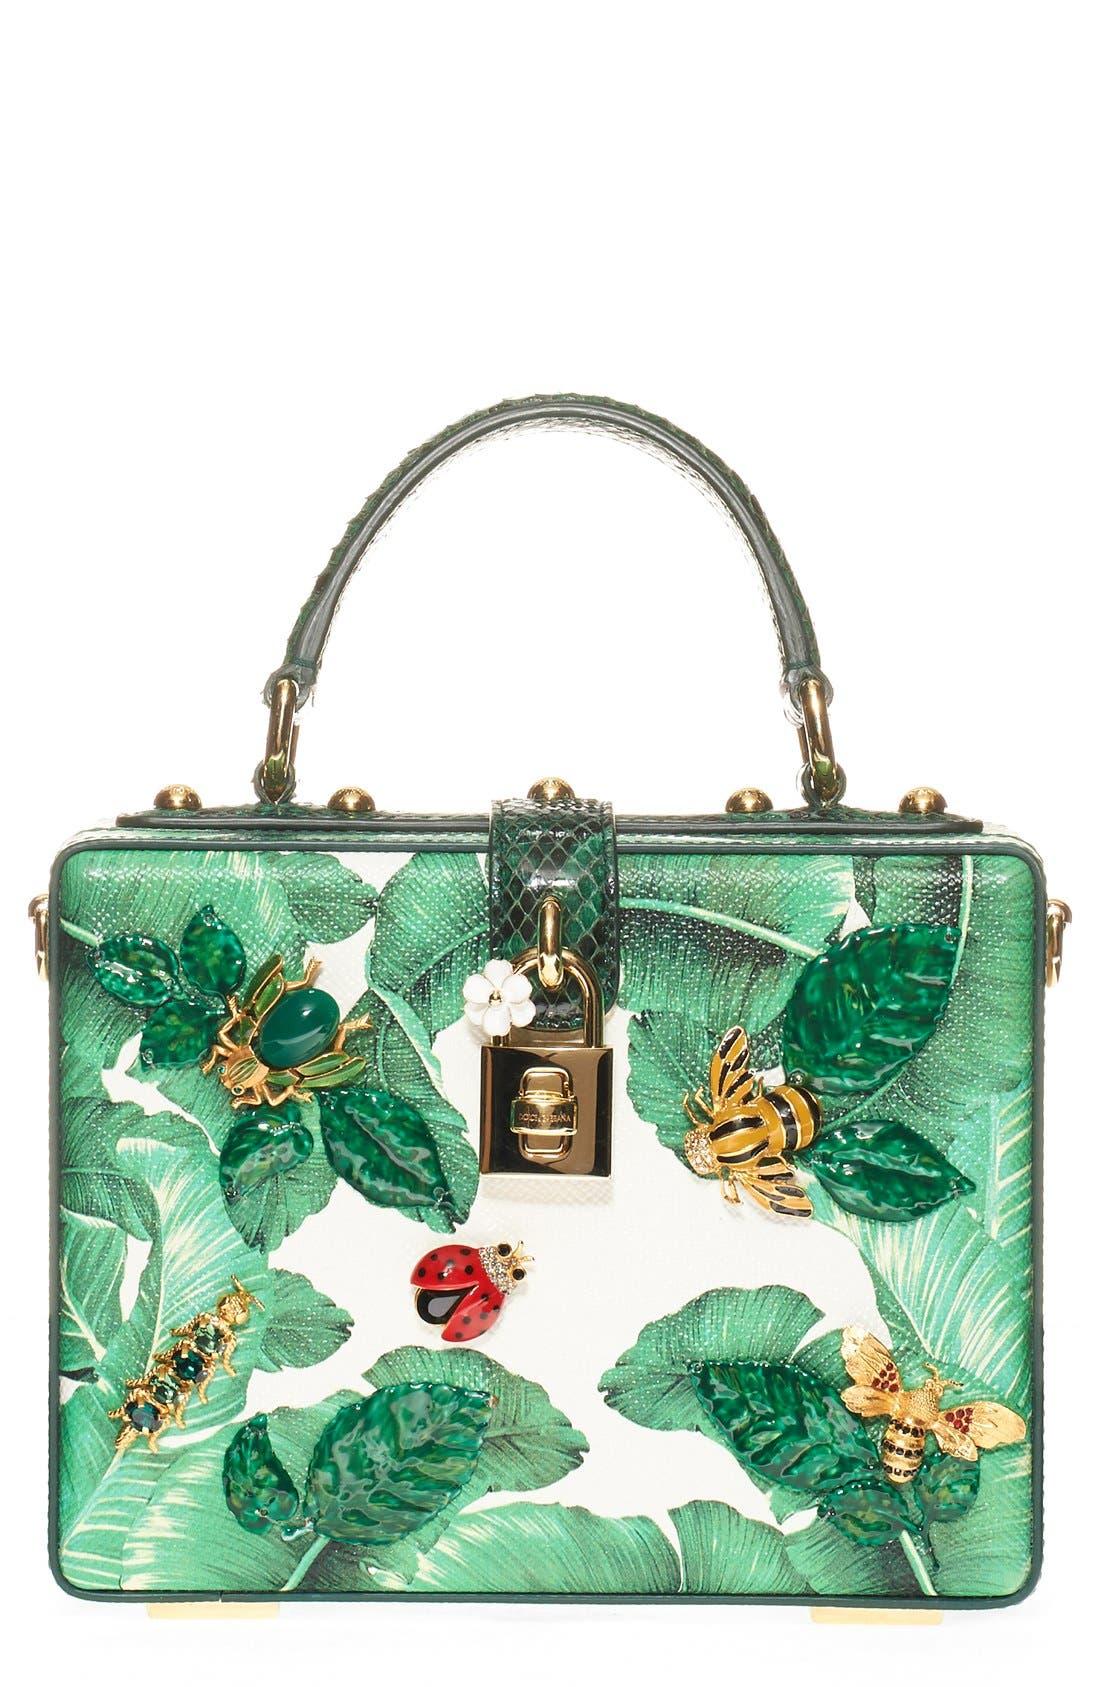 Main Image - Dolce&Gabbana 'Banana Leaf' Embellished Leather & Snakeskin Box Bag